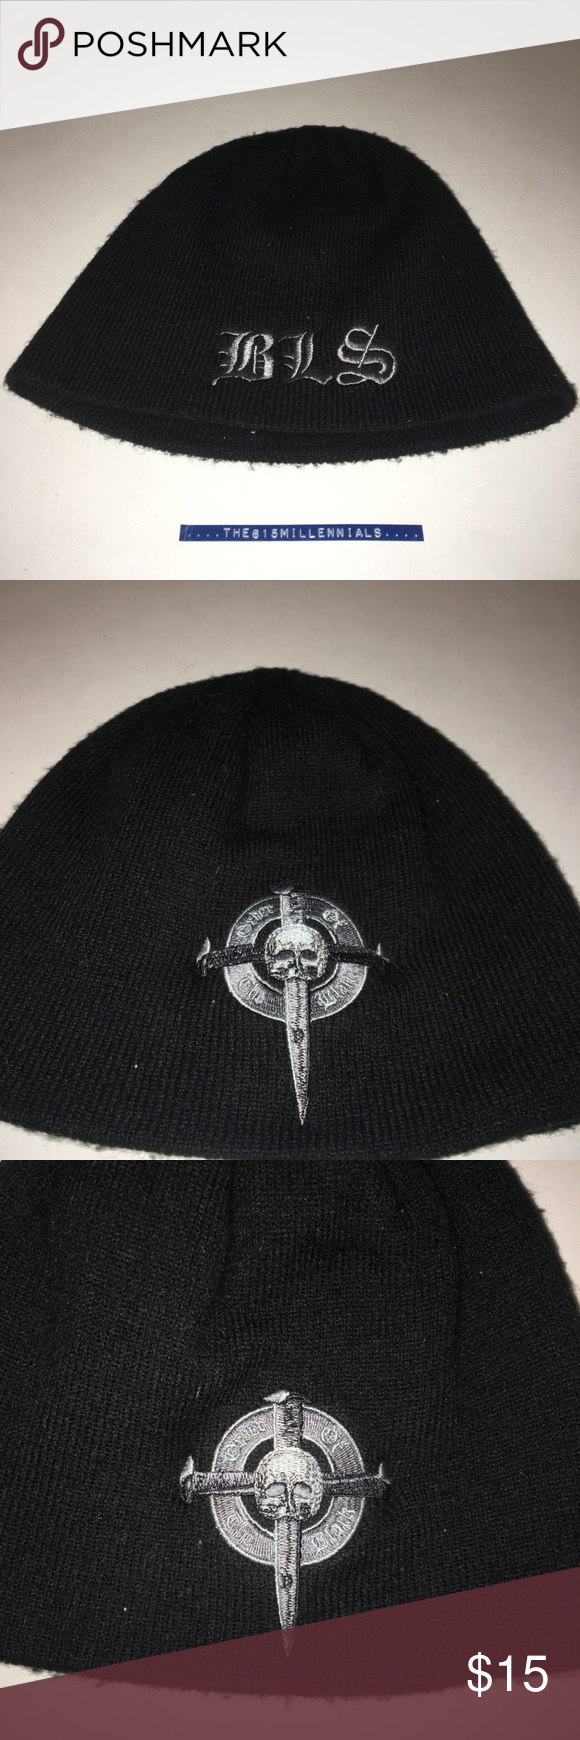 5c224165aef Black Label Society Beanie Hat. Zakk Wylde O S Preworn Black Label Society  Beanie. Band fronted by guitar player Zakk Wylde. It is a one size fits all.